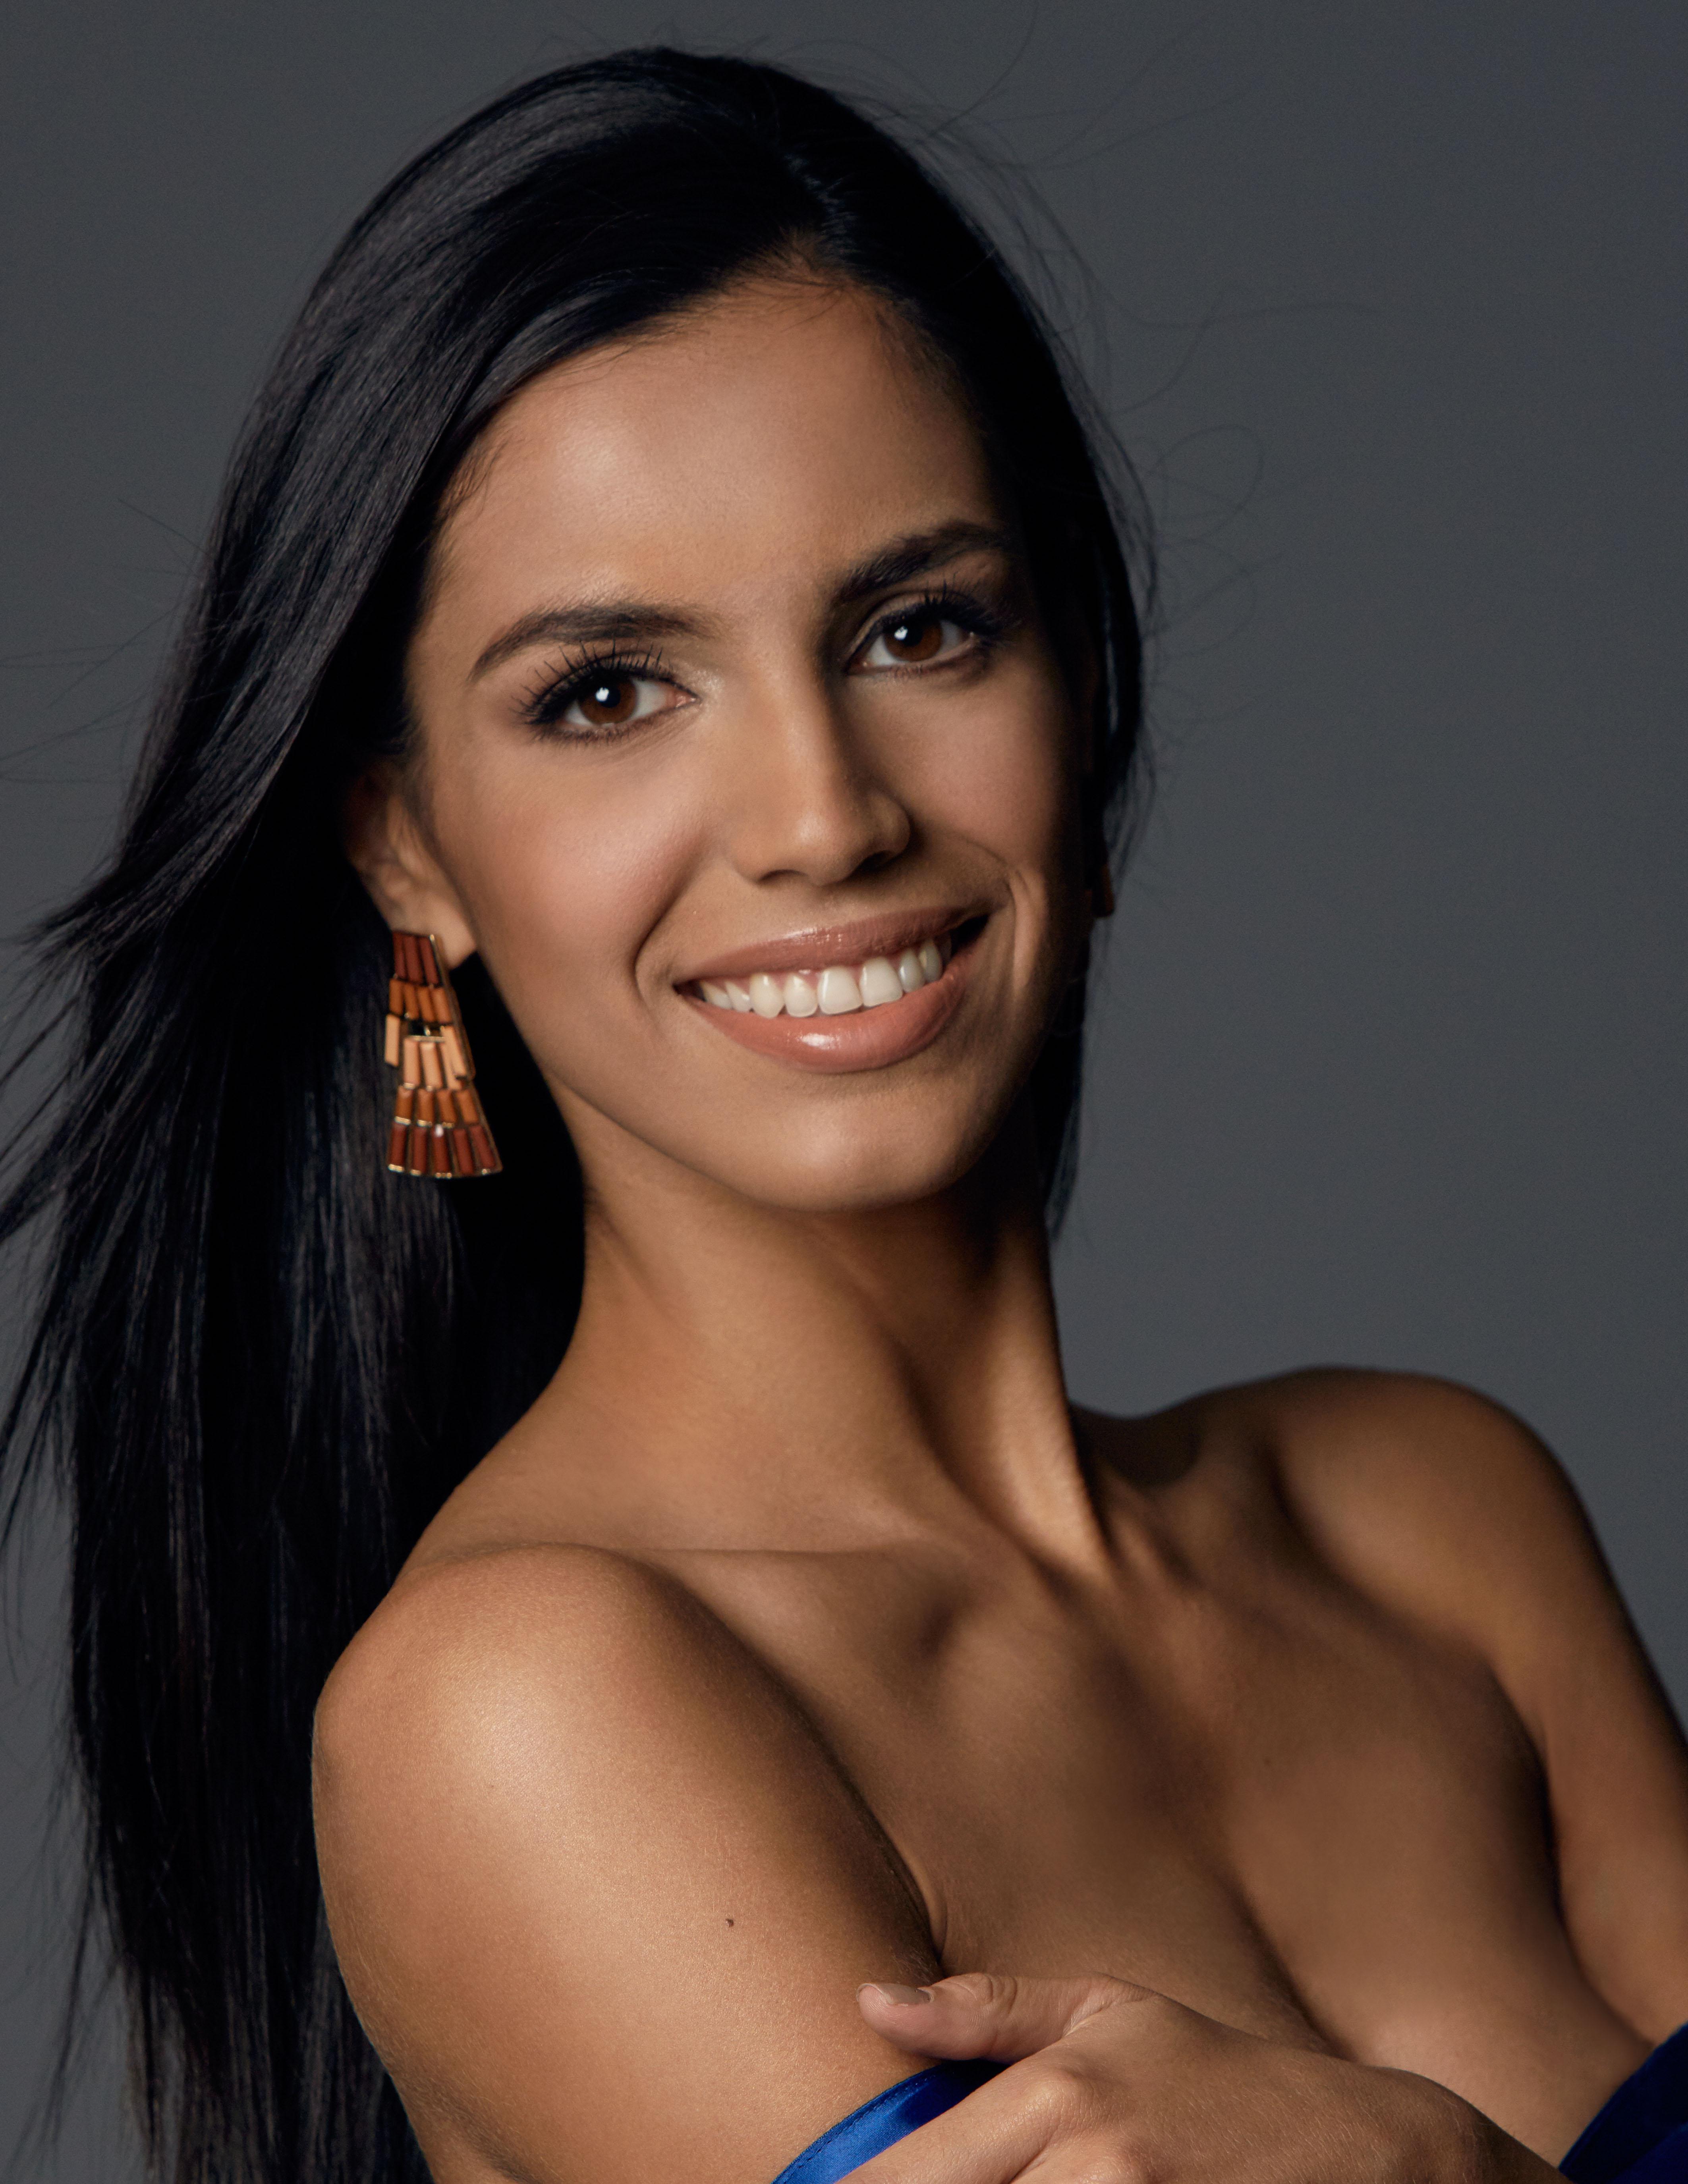 Paraguay - Andrea Melgarejo